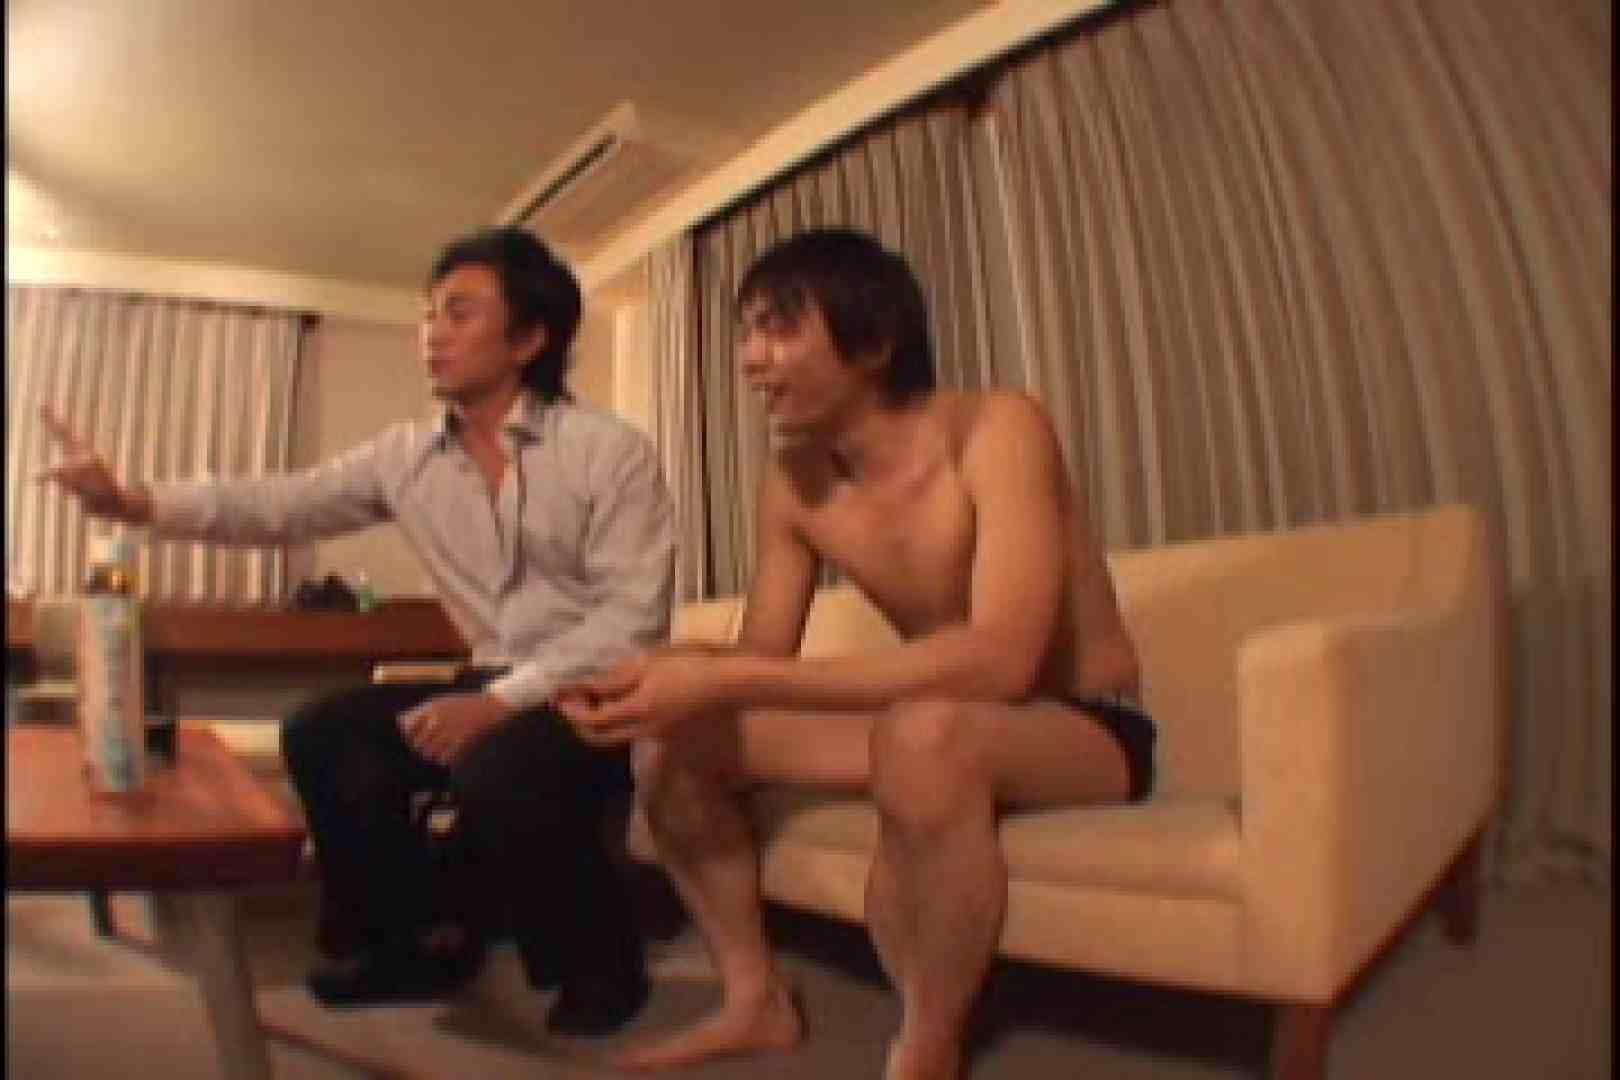 BEST OF イケメン!!男目線のガチSEX vol.04(対女性作品) 対女性 ゲイアダルトビデオ画像 92枚 35